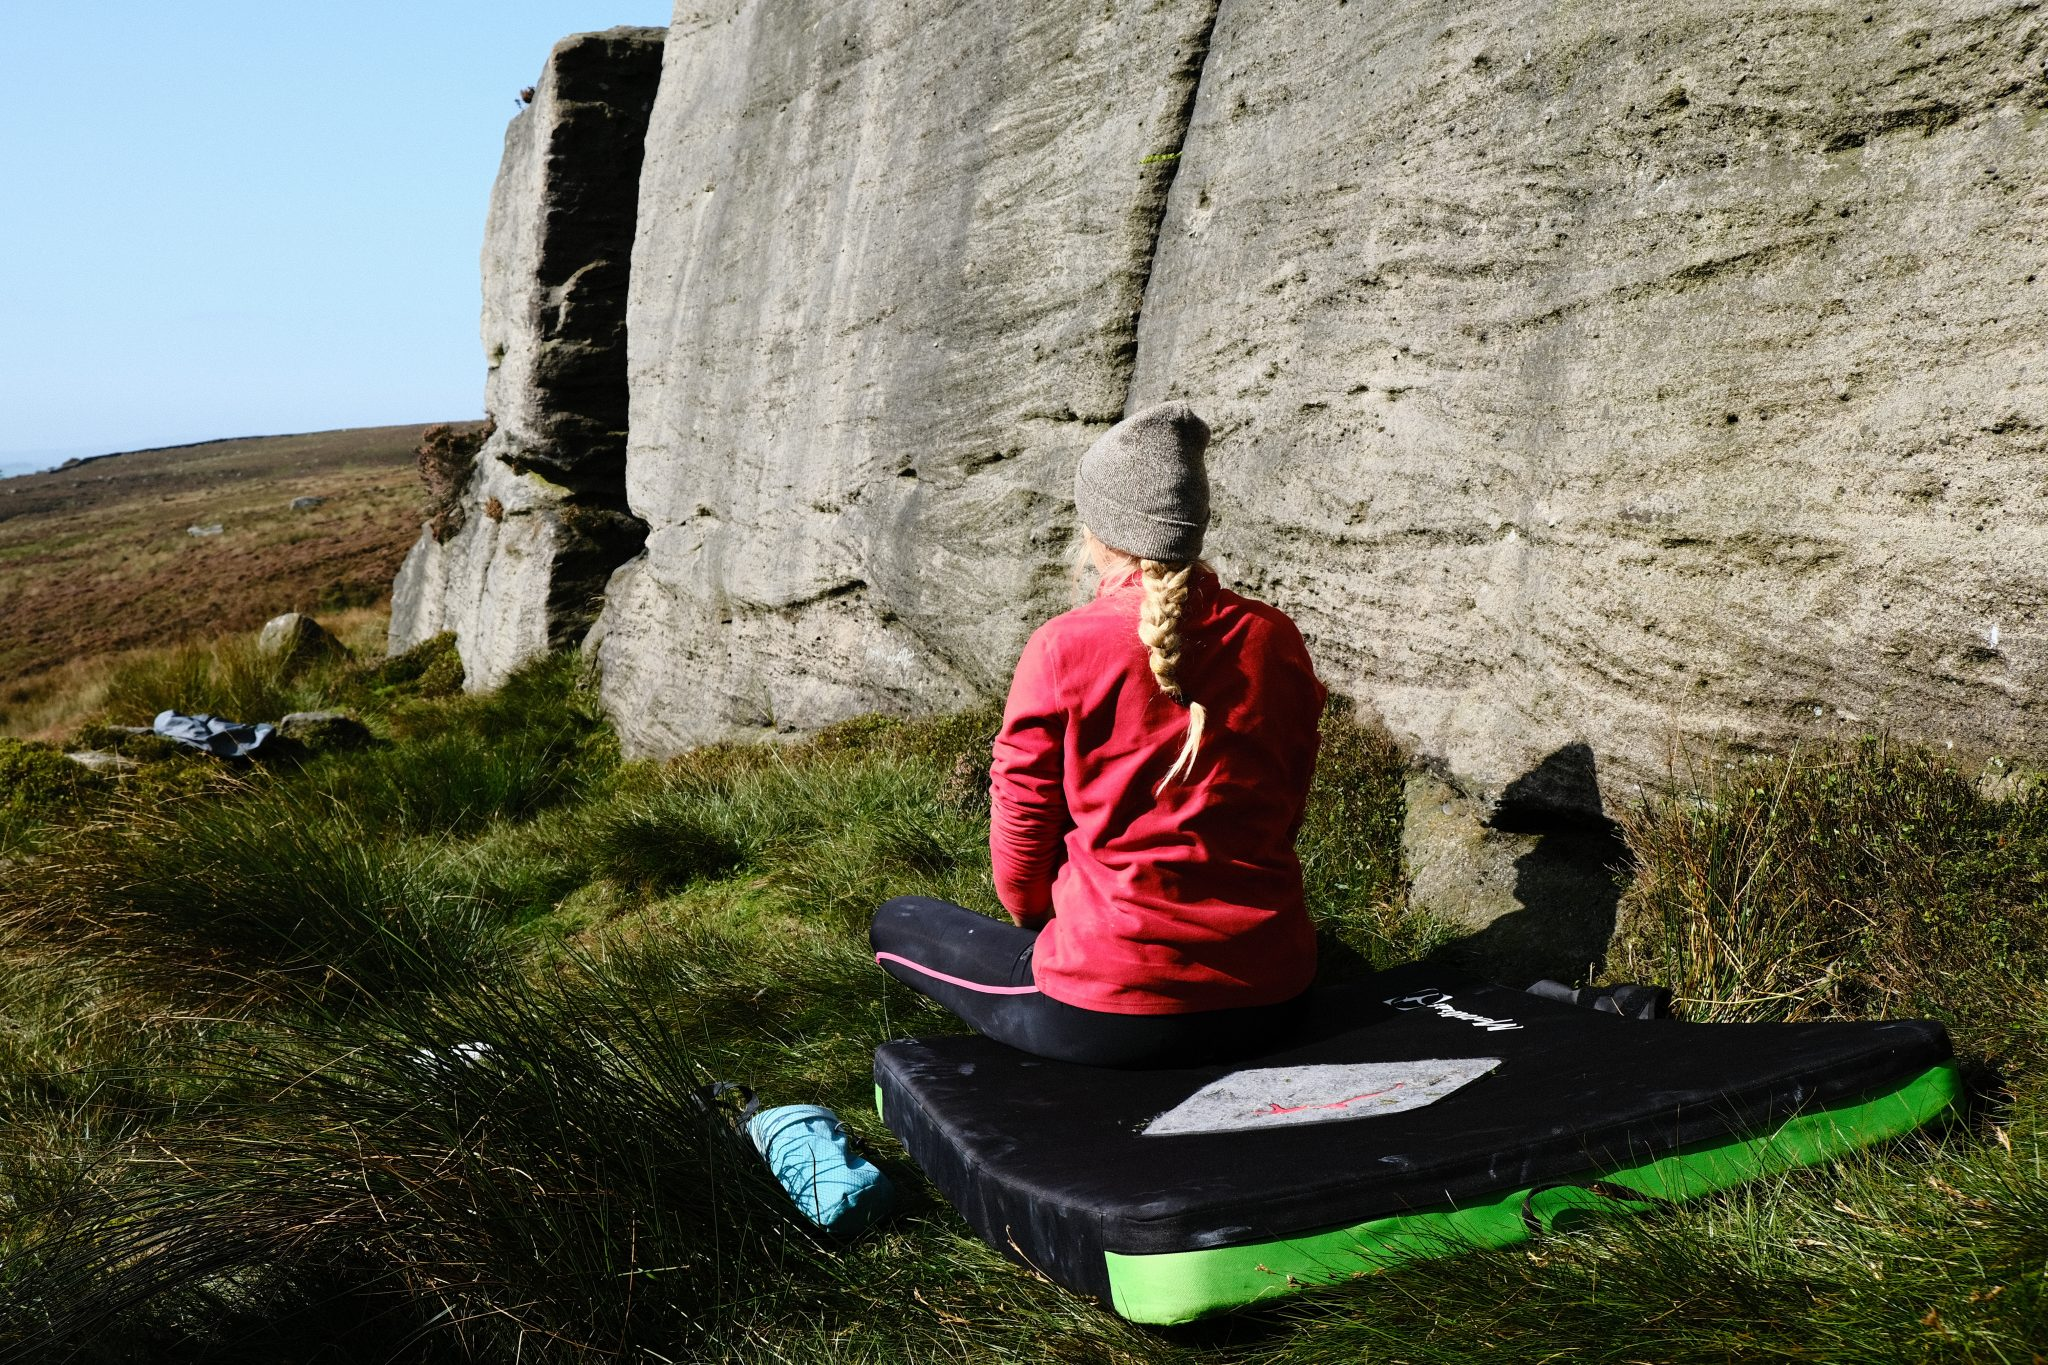 Climber sitting on a climbing pad